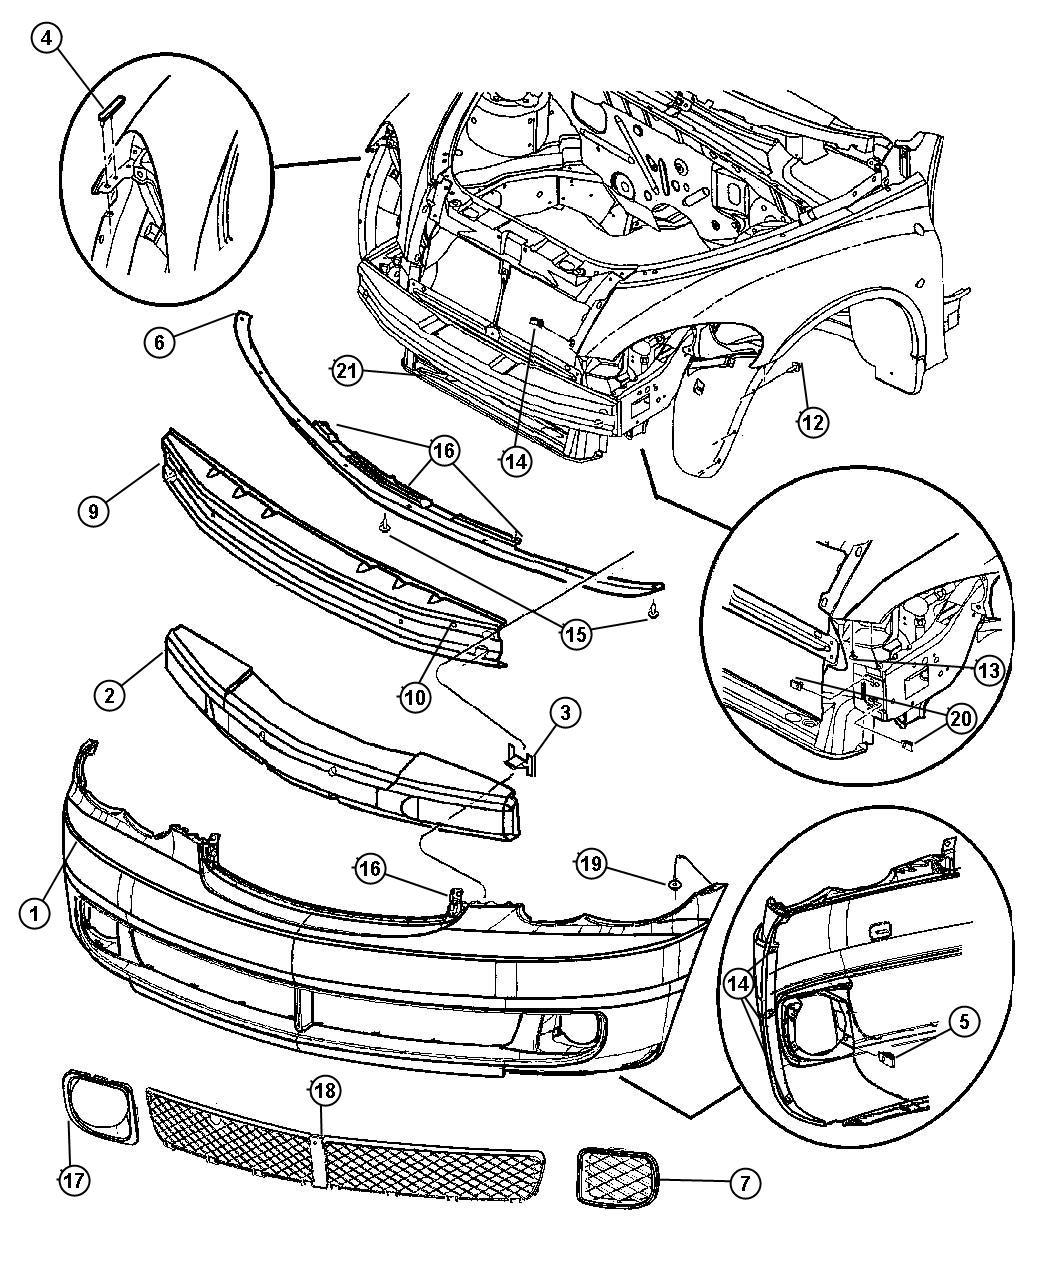 Acura Mdx Fuse Panels Acura Auto Fuse Box Diagram